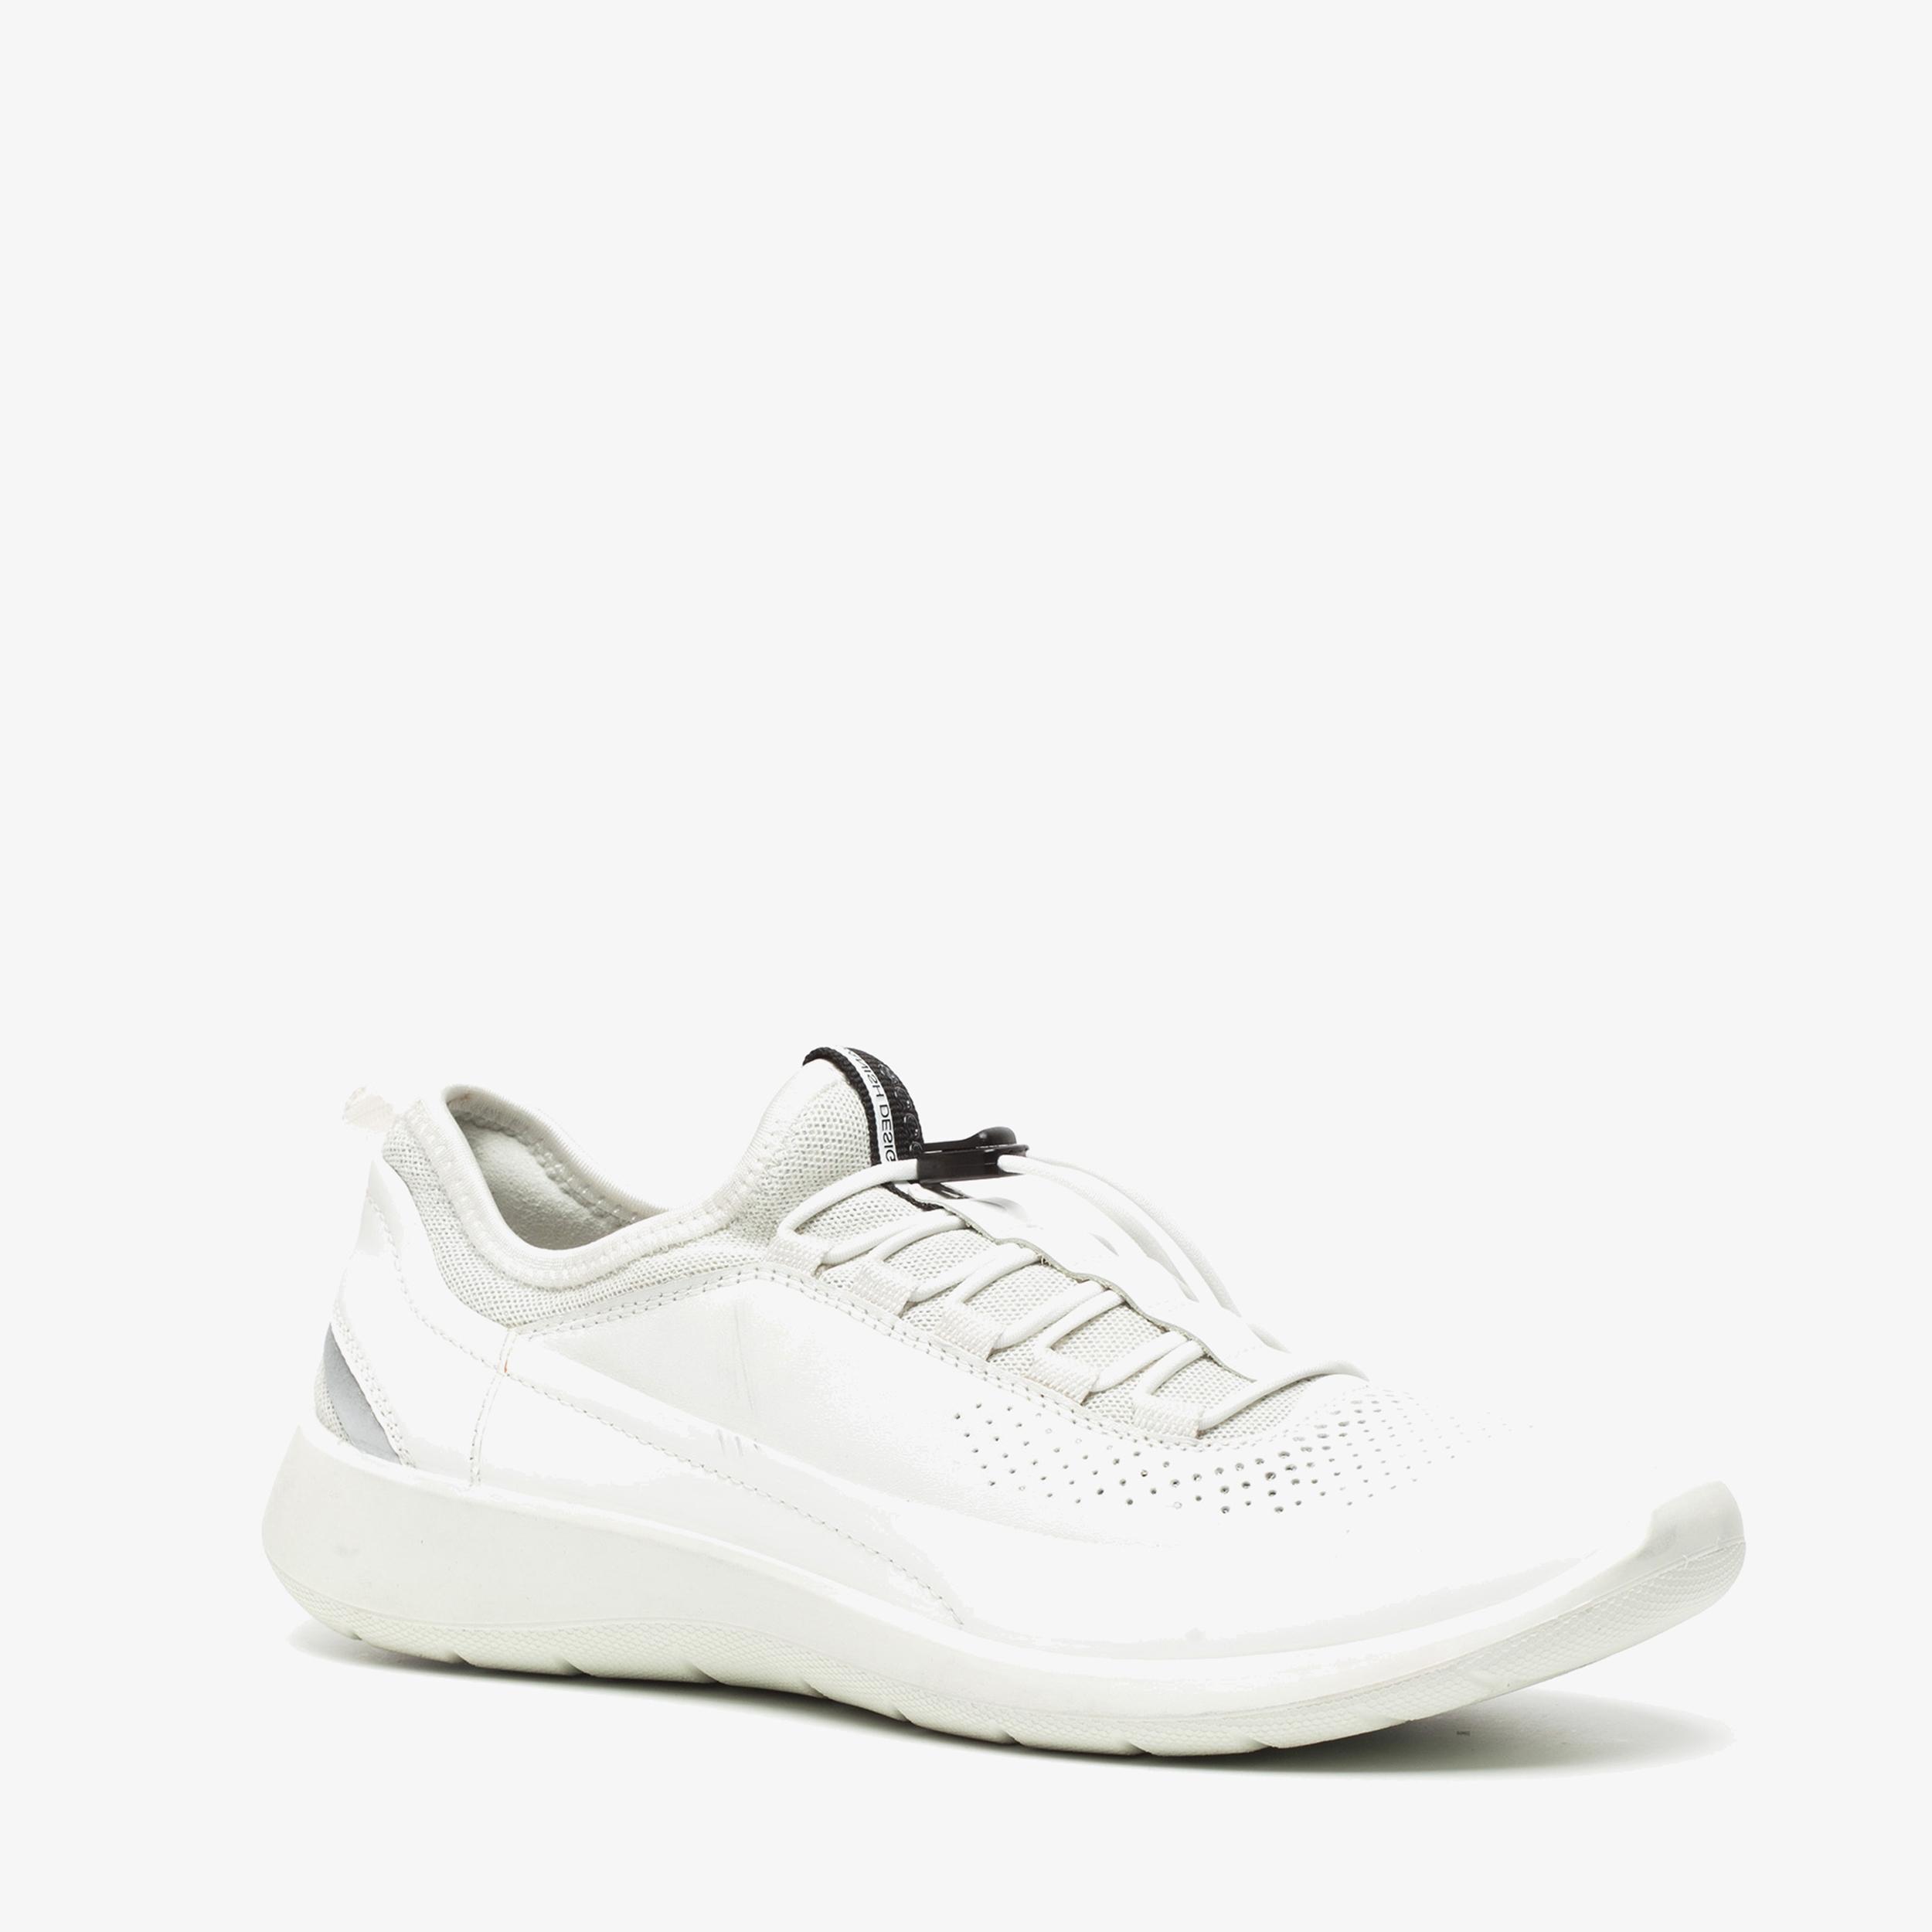 Ecco Soft 4 leren dames sneakers | Scapino.nl